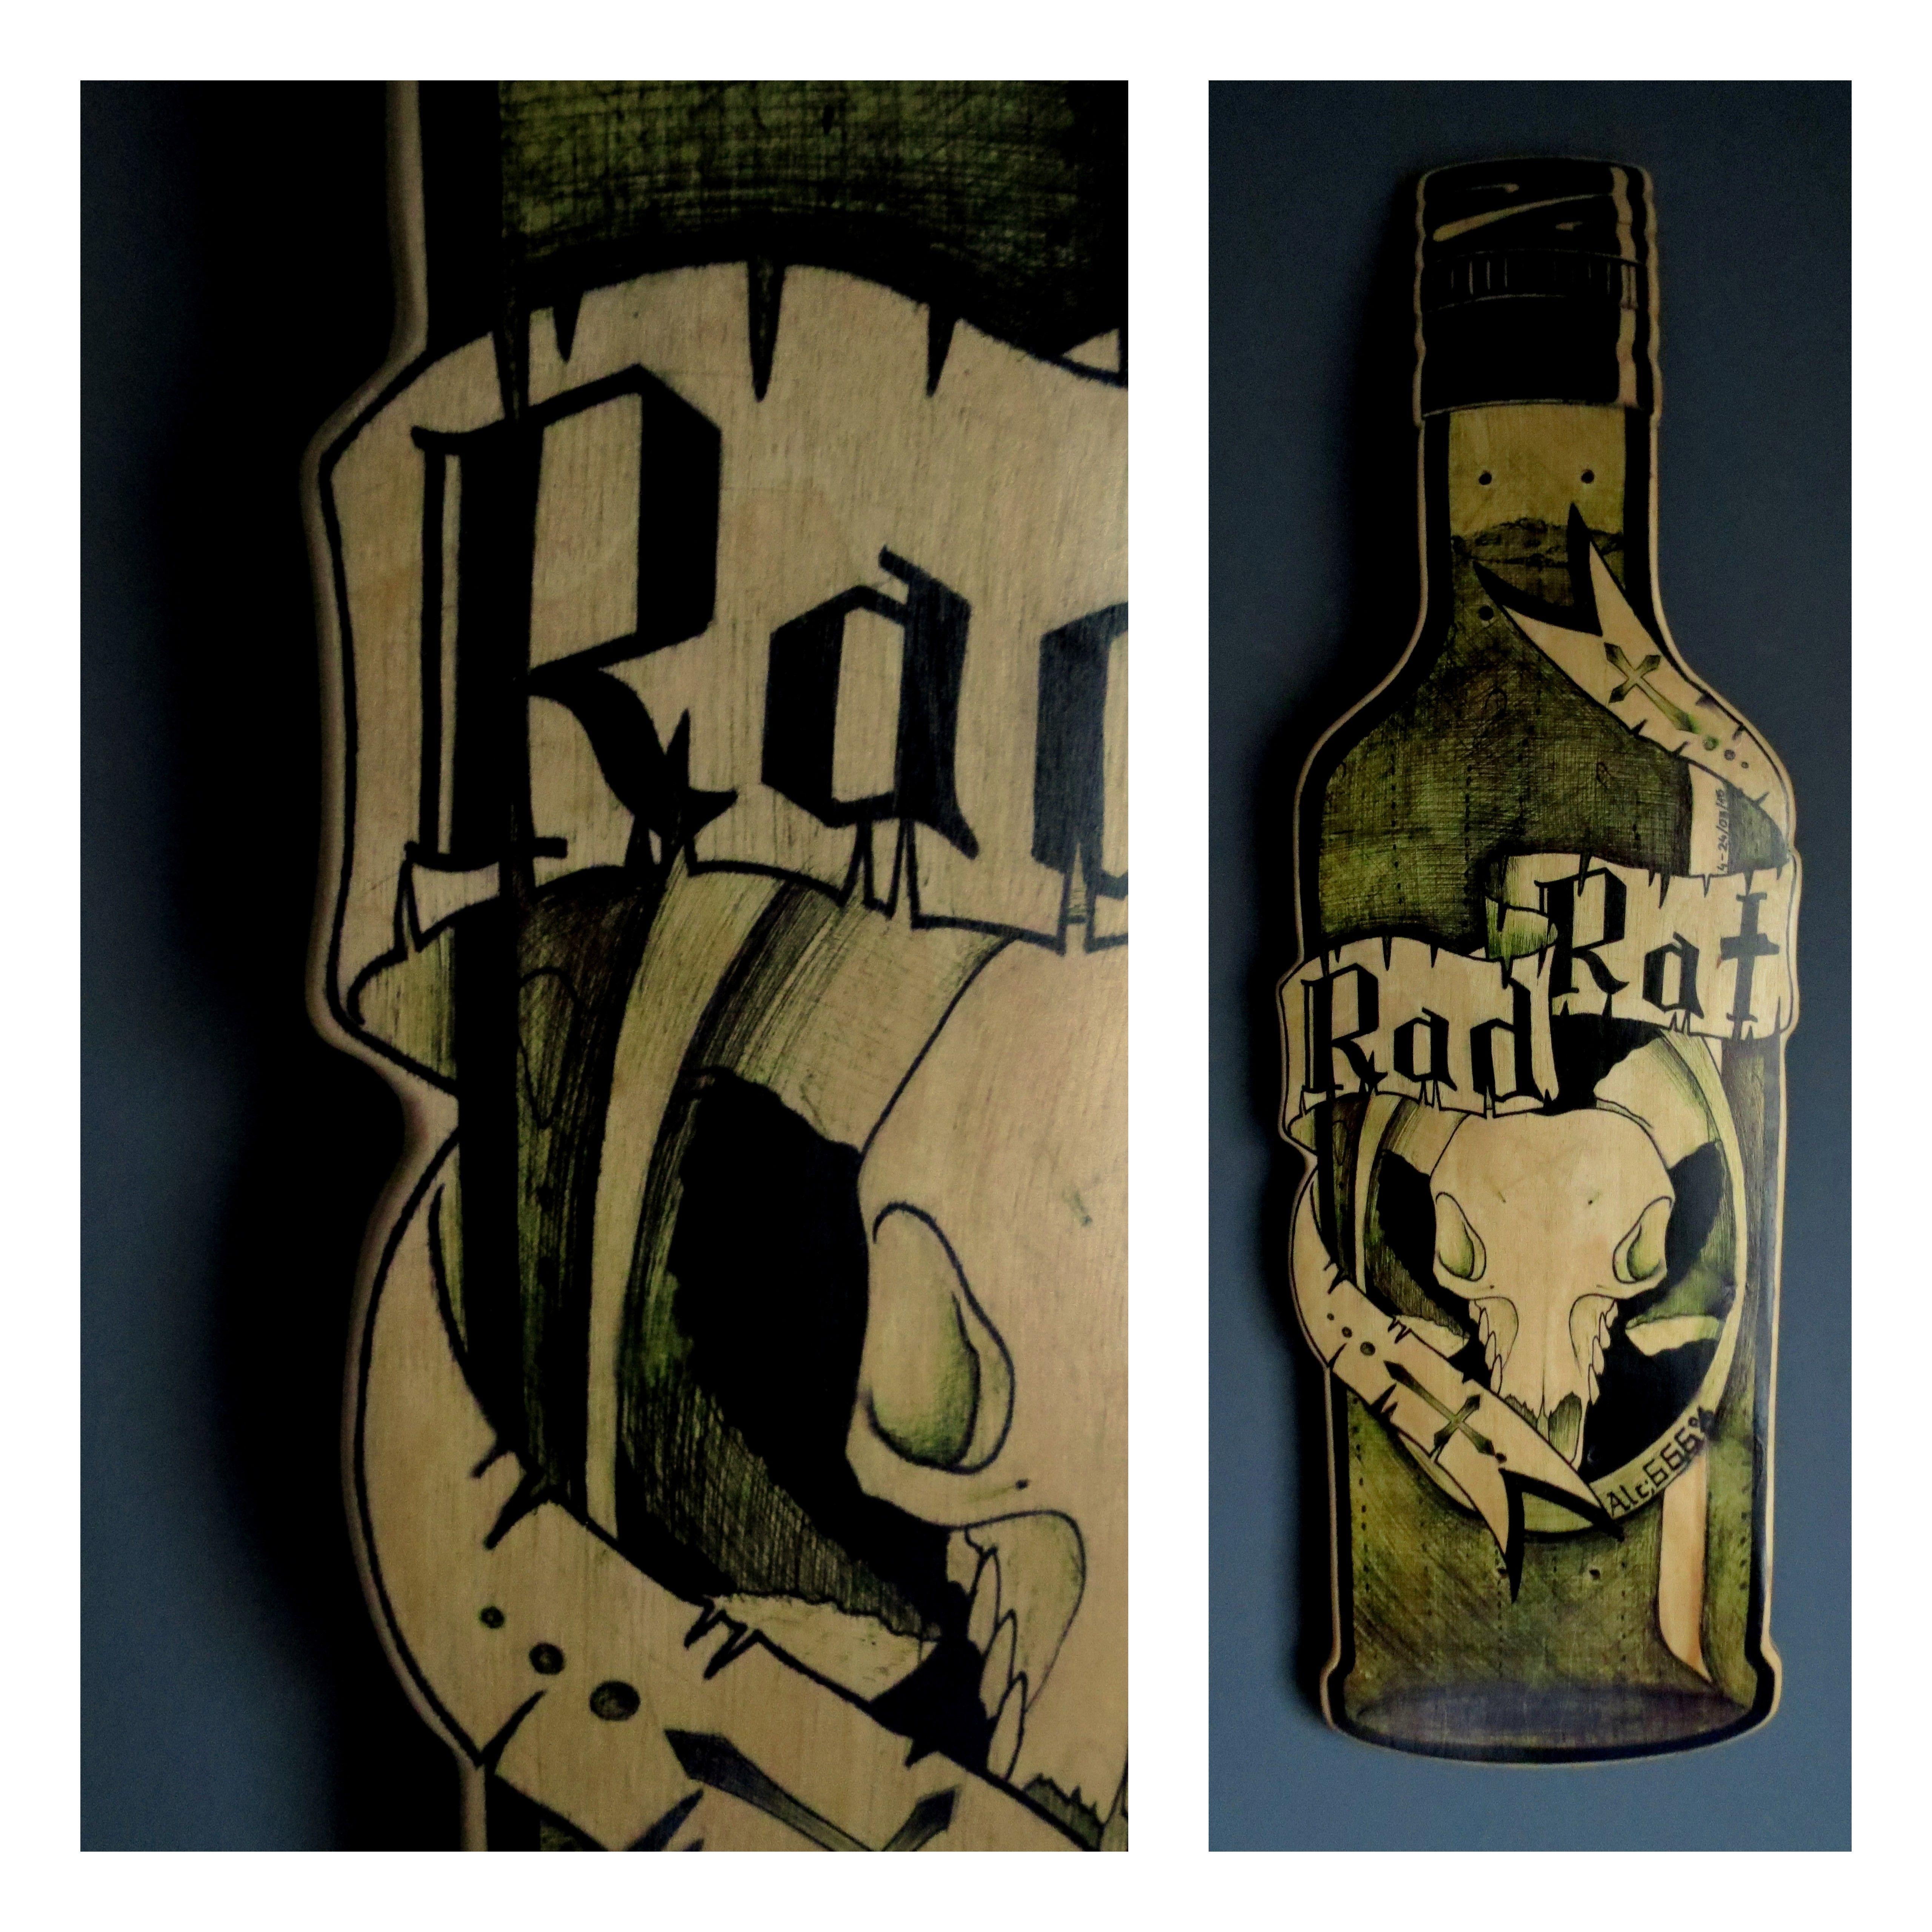 "Handmade, Handpainted, Hand-Painted Skateboard Deck ~~ Bottle 4-24|03|15 ~~ Width: 8,5"" / 21,59 cm ~~ Laenght: 28,5"" / 72,39 cm"